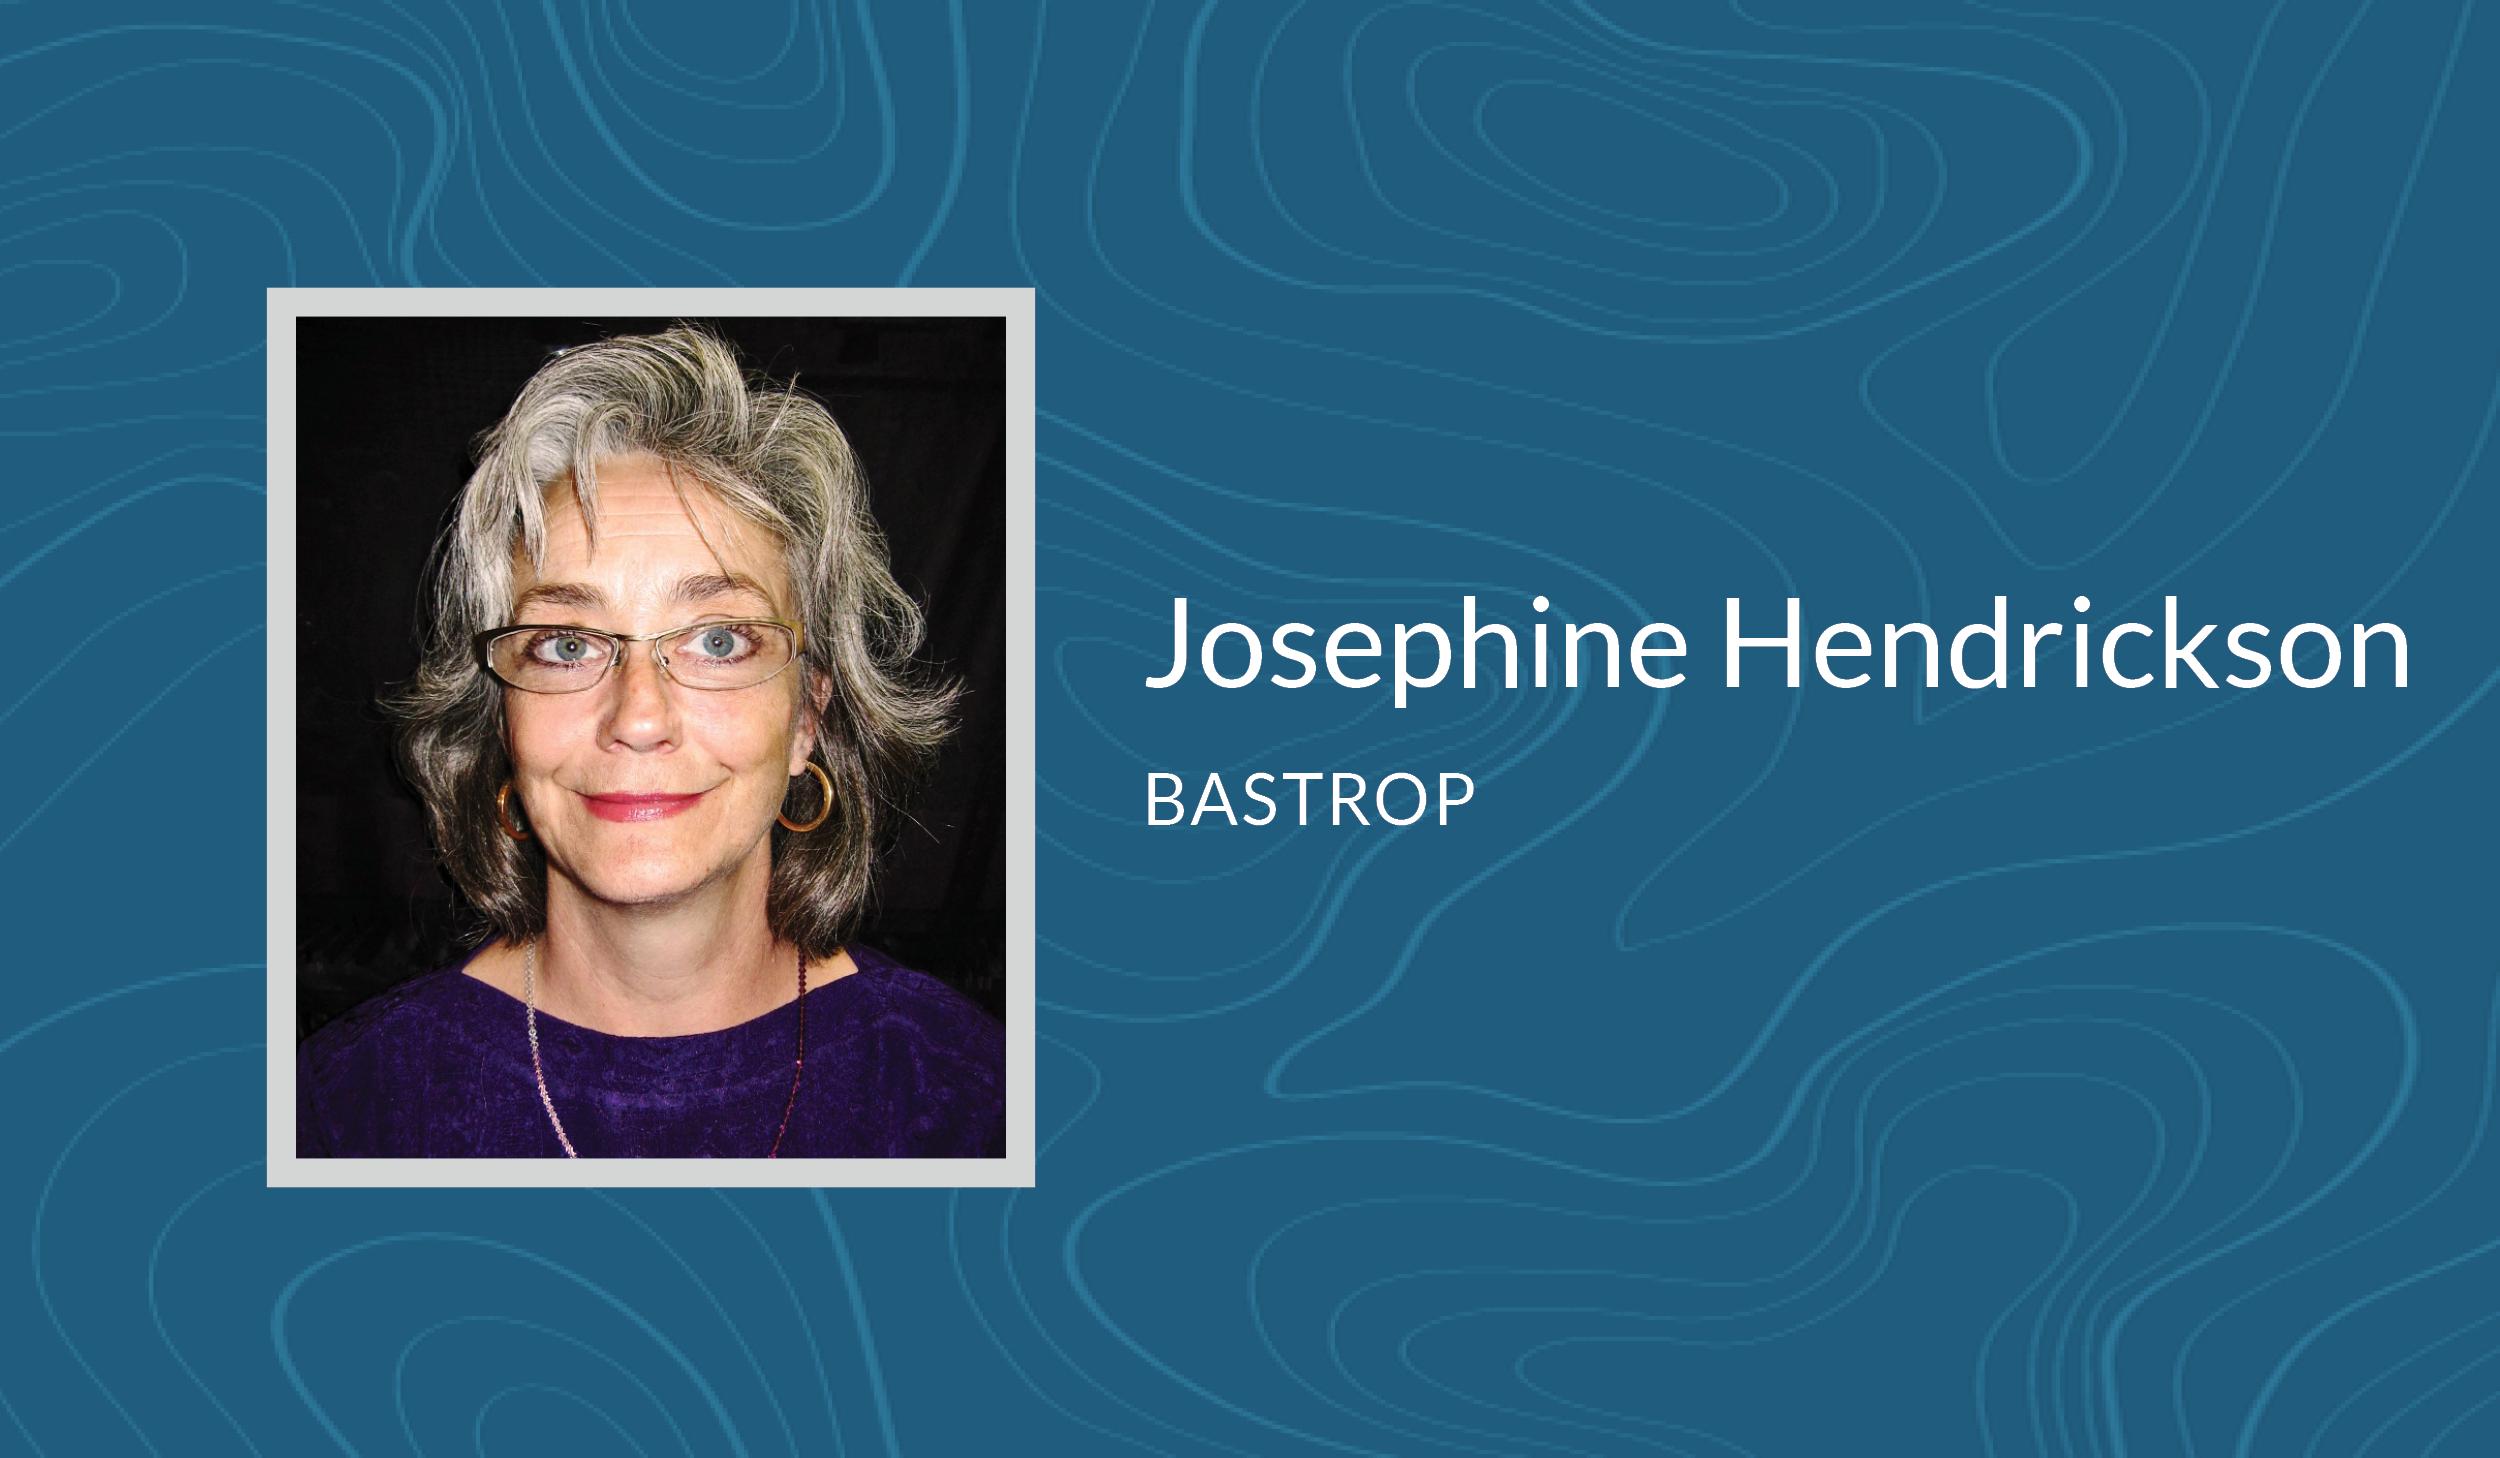 josephine Hendrickson Landing Page Headers.png